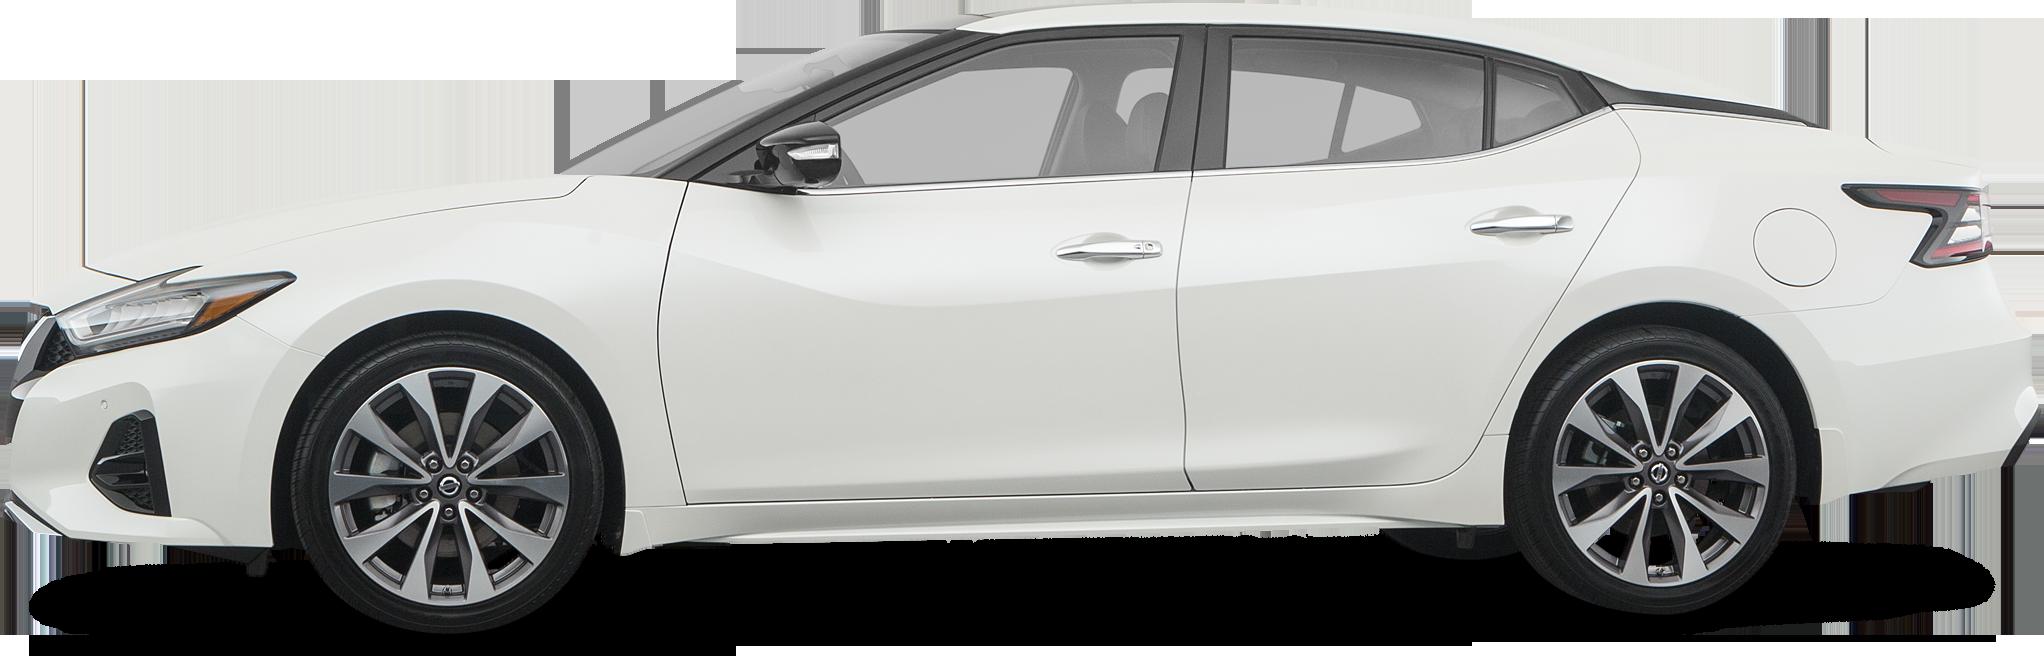 2019 Nissan Maxima Sedan 3.5 Platinum